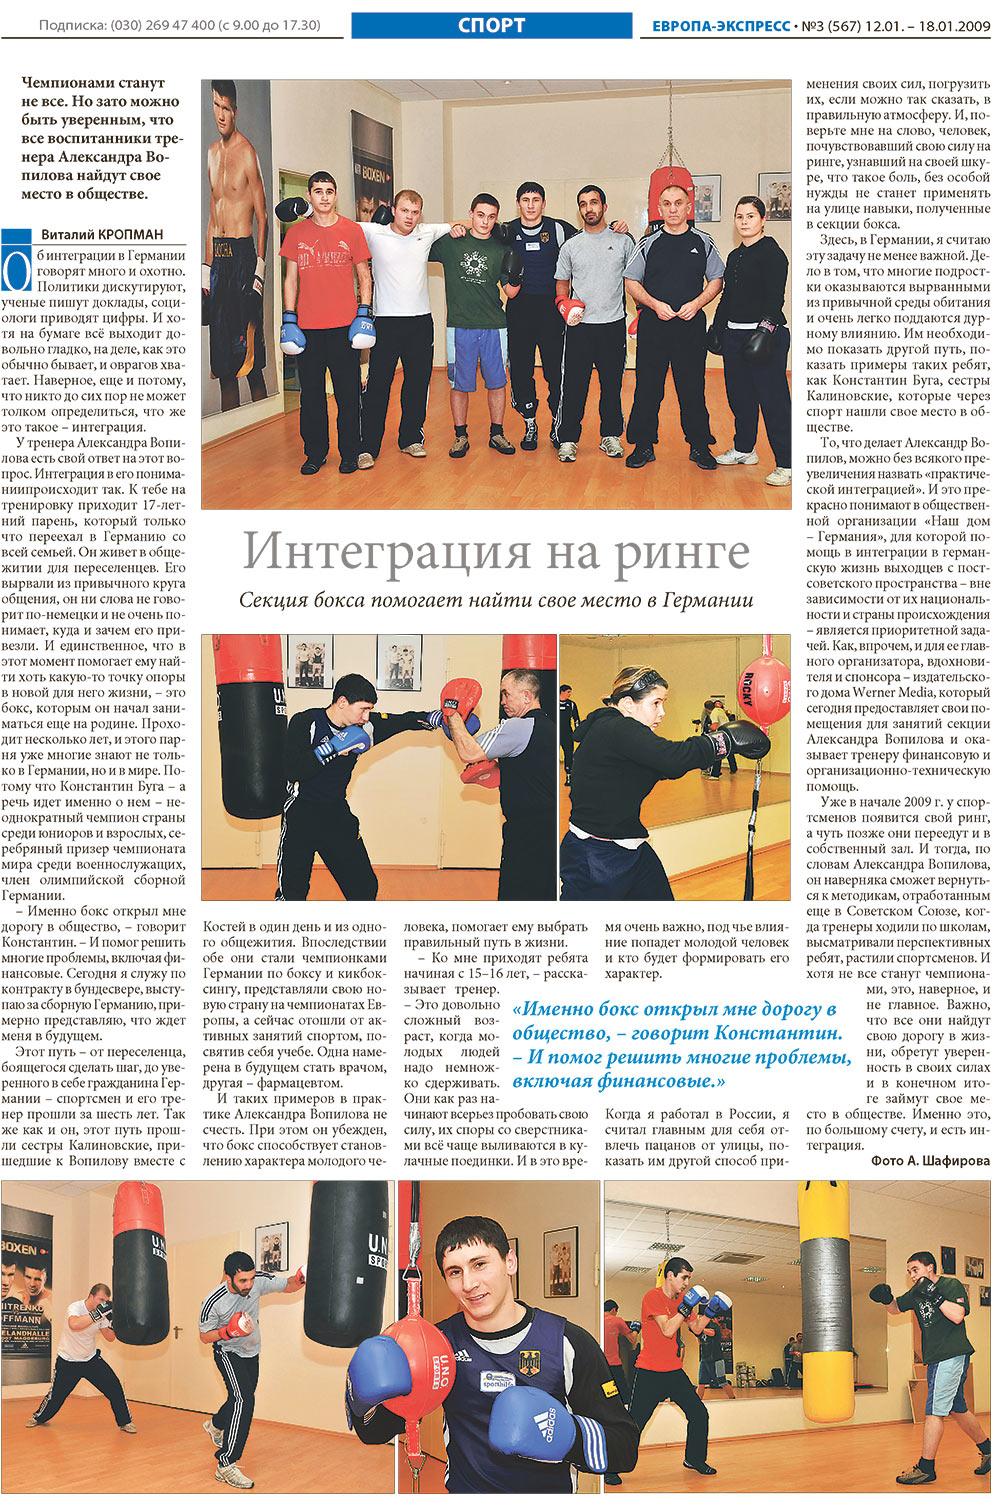 Европа экспресс (газета). 2009 год, номер 1, стр. 24